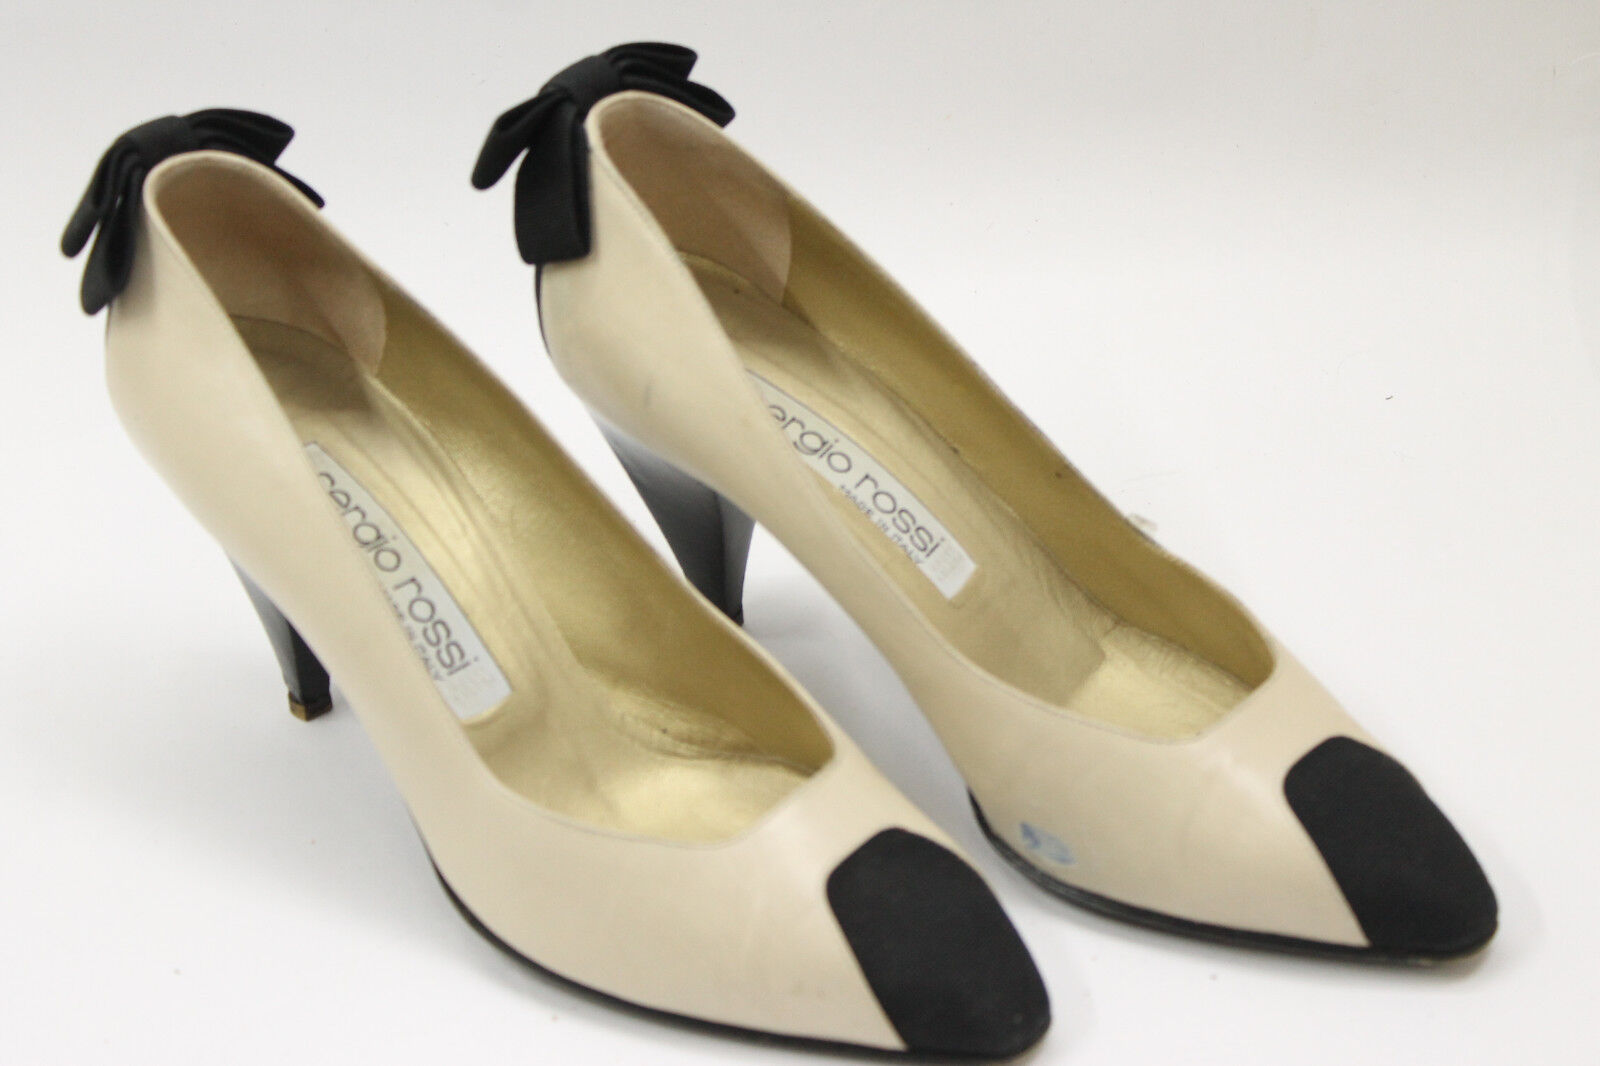 vendite online SERGIO ROSSI donna scarpe scarpe scarpe sz 7.5 Europe 38 beige leather nero canvas S7107  qualità garantita